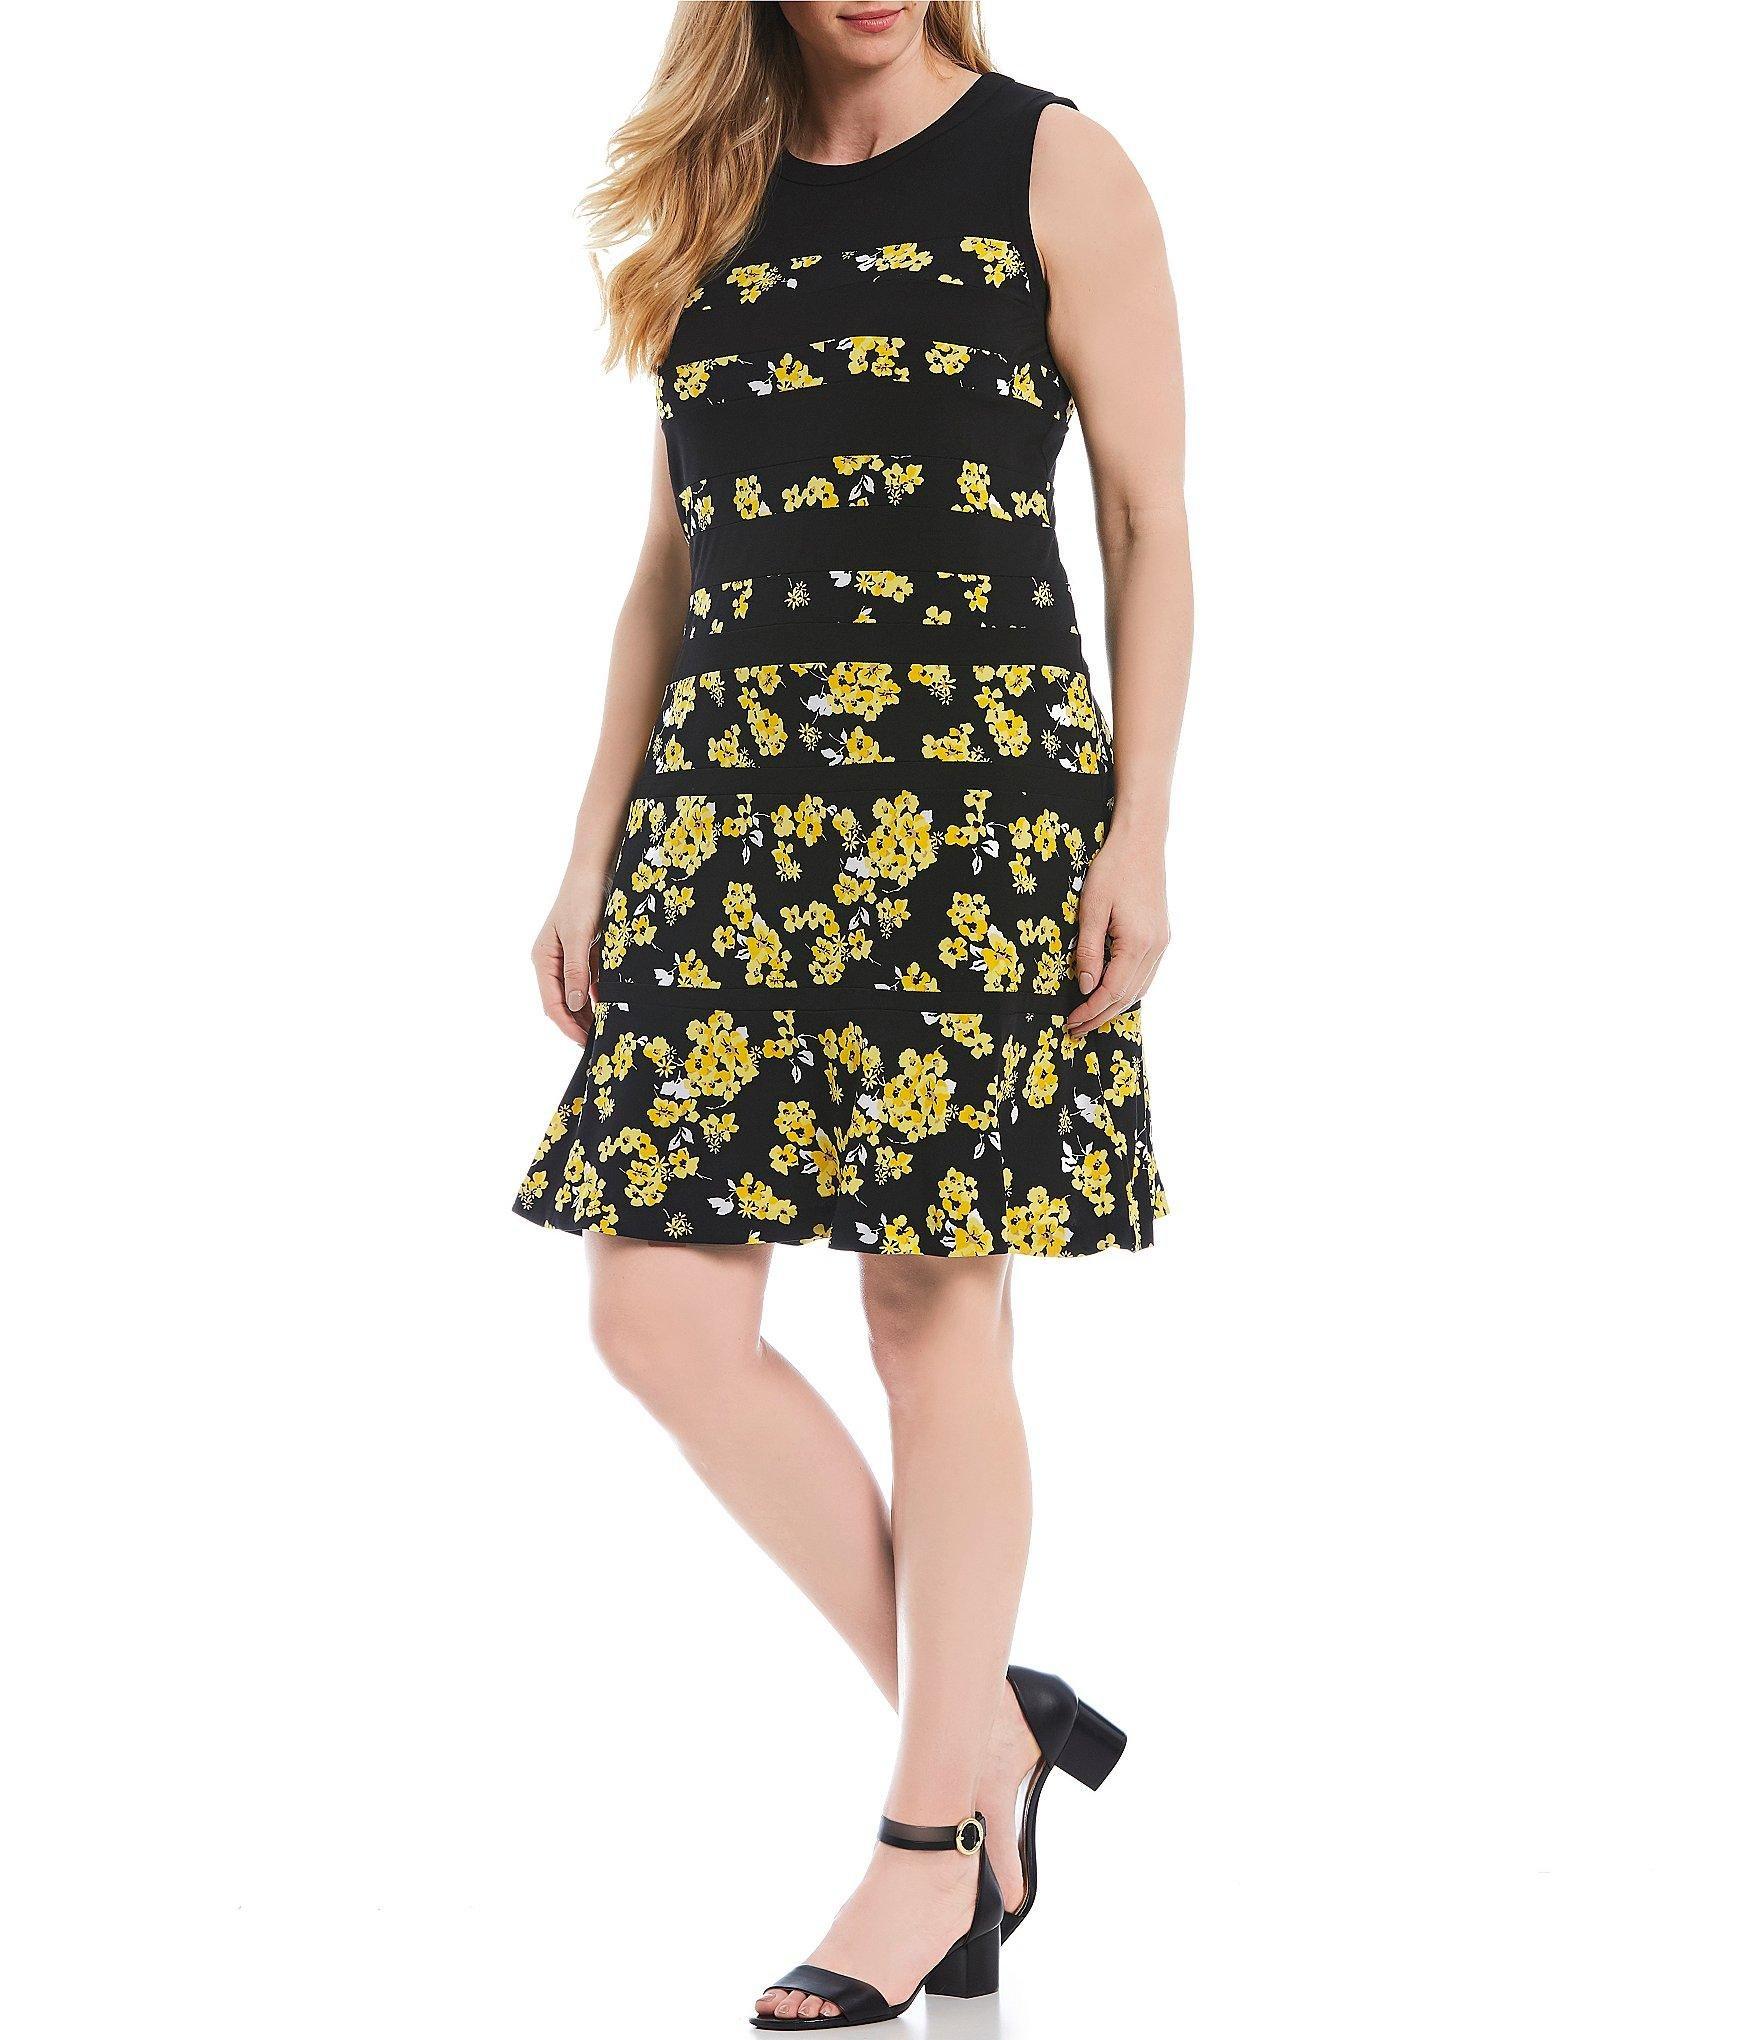 8ed7c6b6c9eb6 MICHAEL Michael Kors. Women's Black Plus Size Glam Painterly Fleur ...